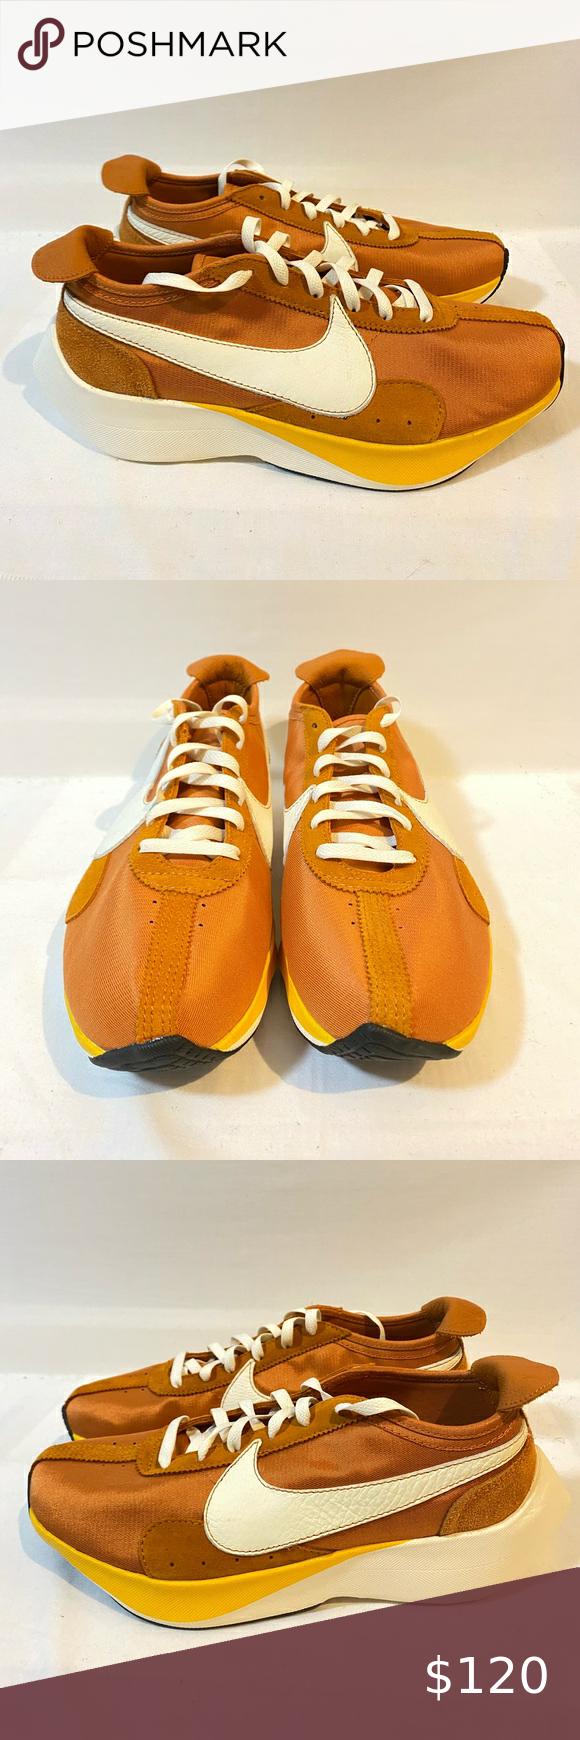 New Nike Moon Racer Qs Men Shoes Monarchs Sz 11 In 2020 Running Shoes For Men New Nike Nike